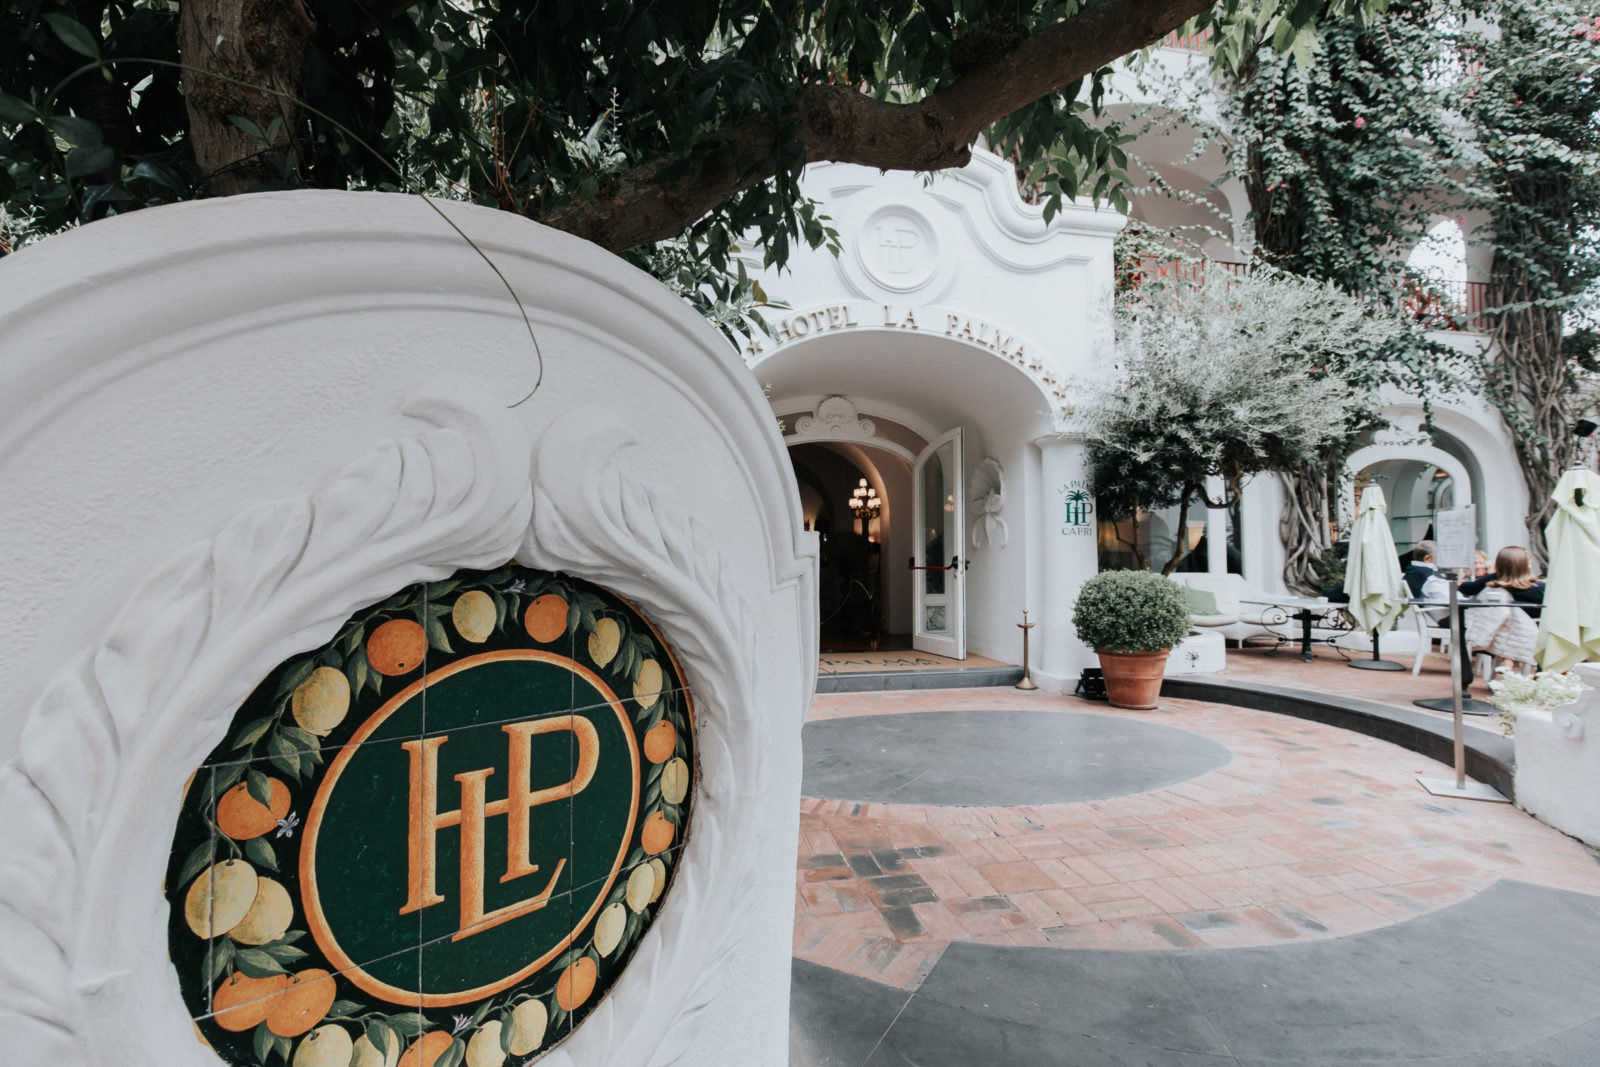 Capri Hotel La Palma Eingang